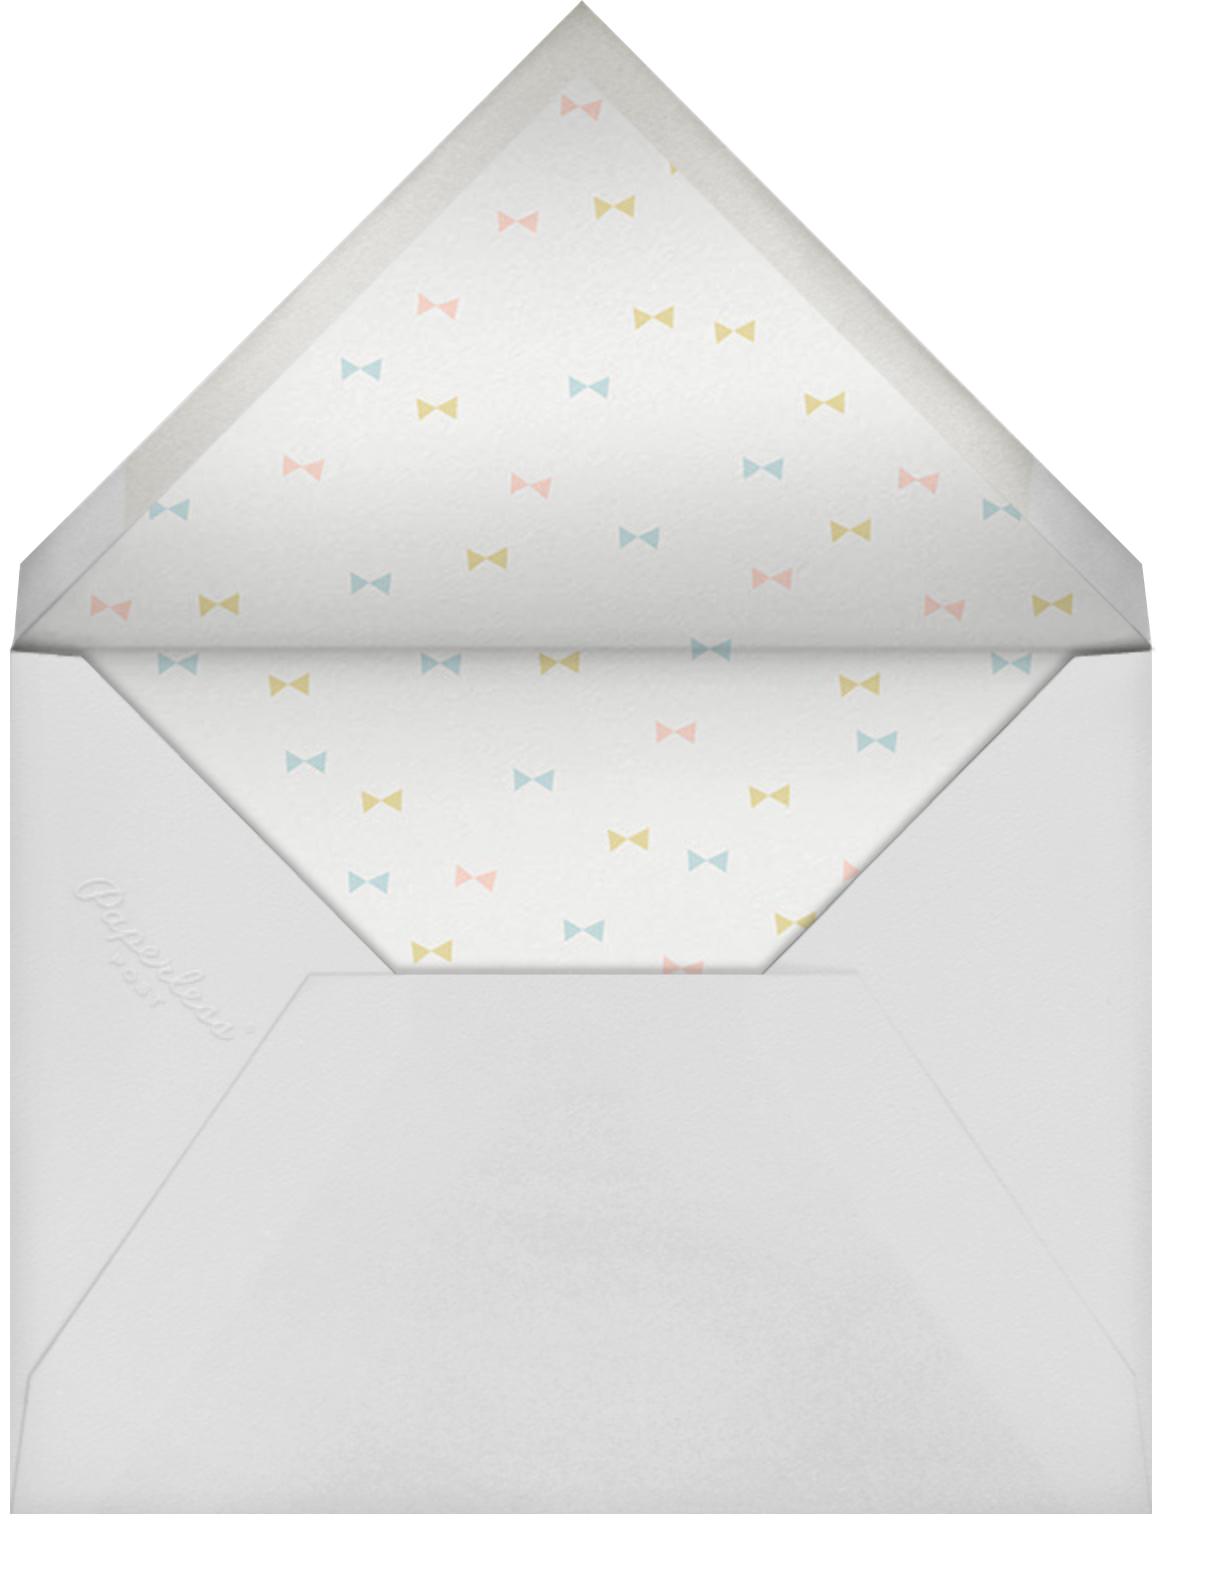 First Flight - Mint - Little Cube - Baby shower - envelope back